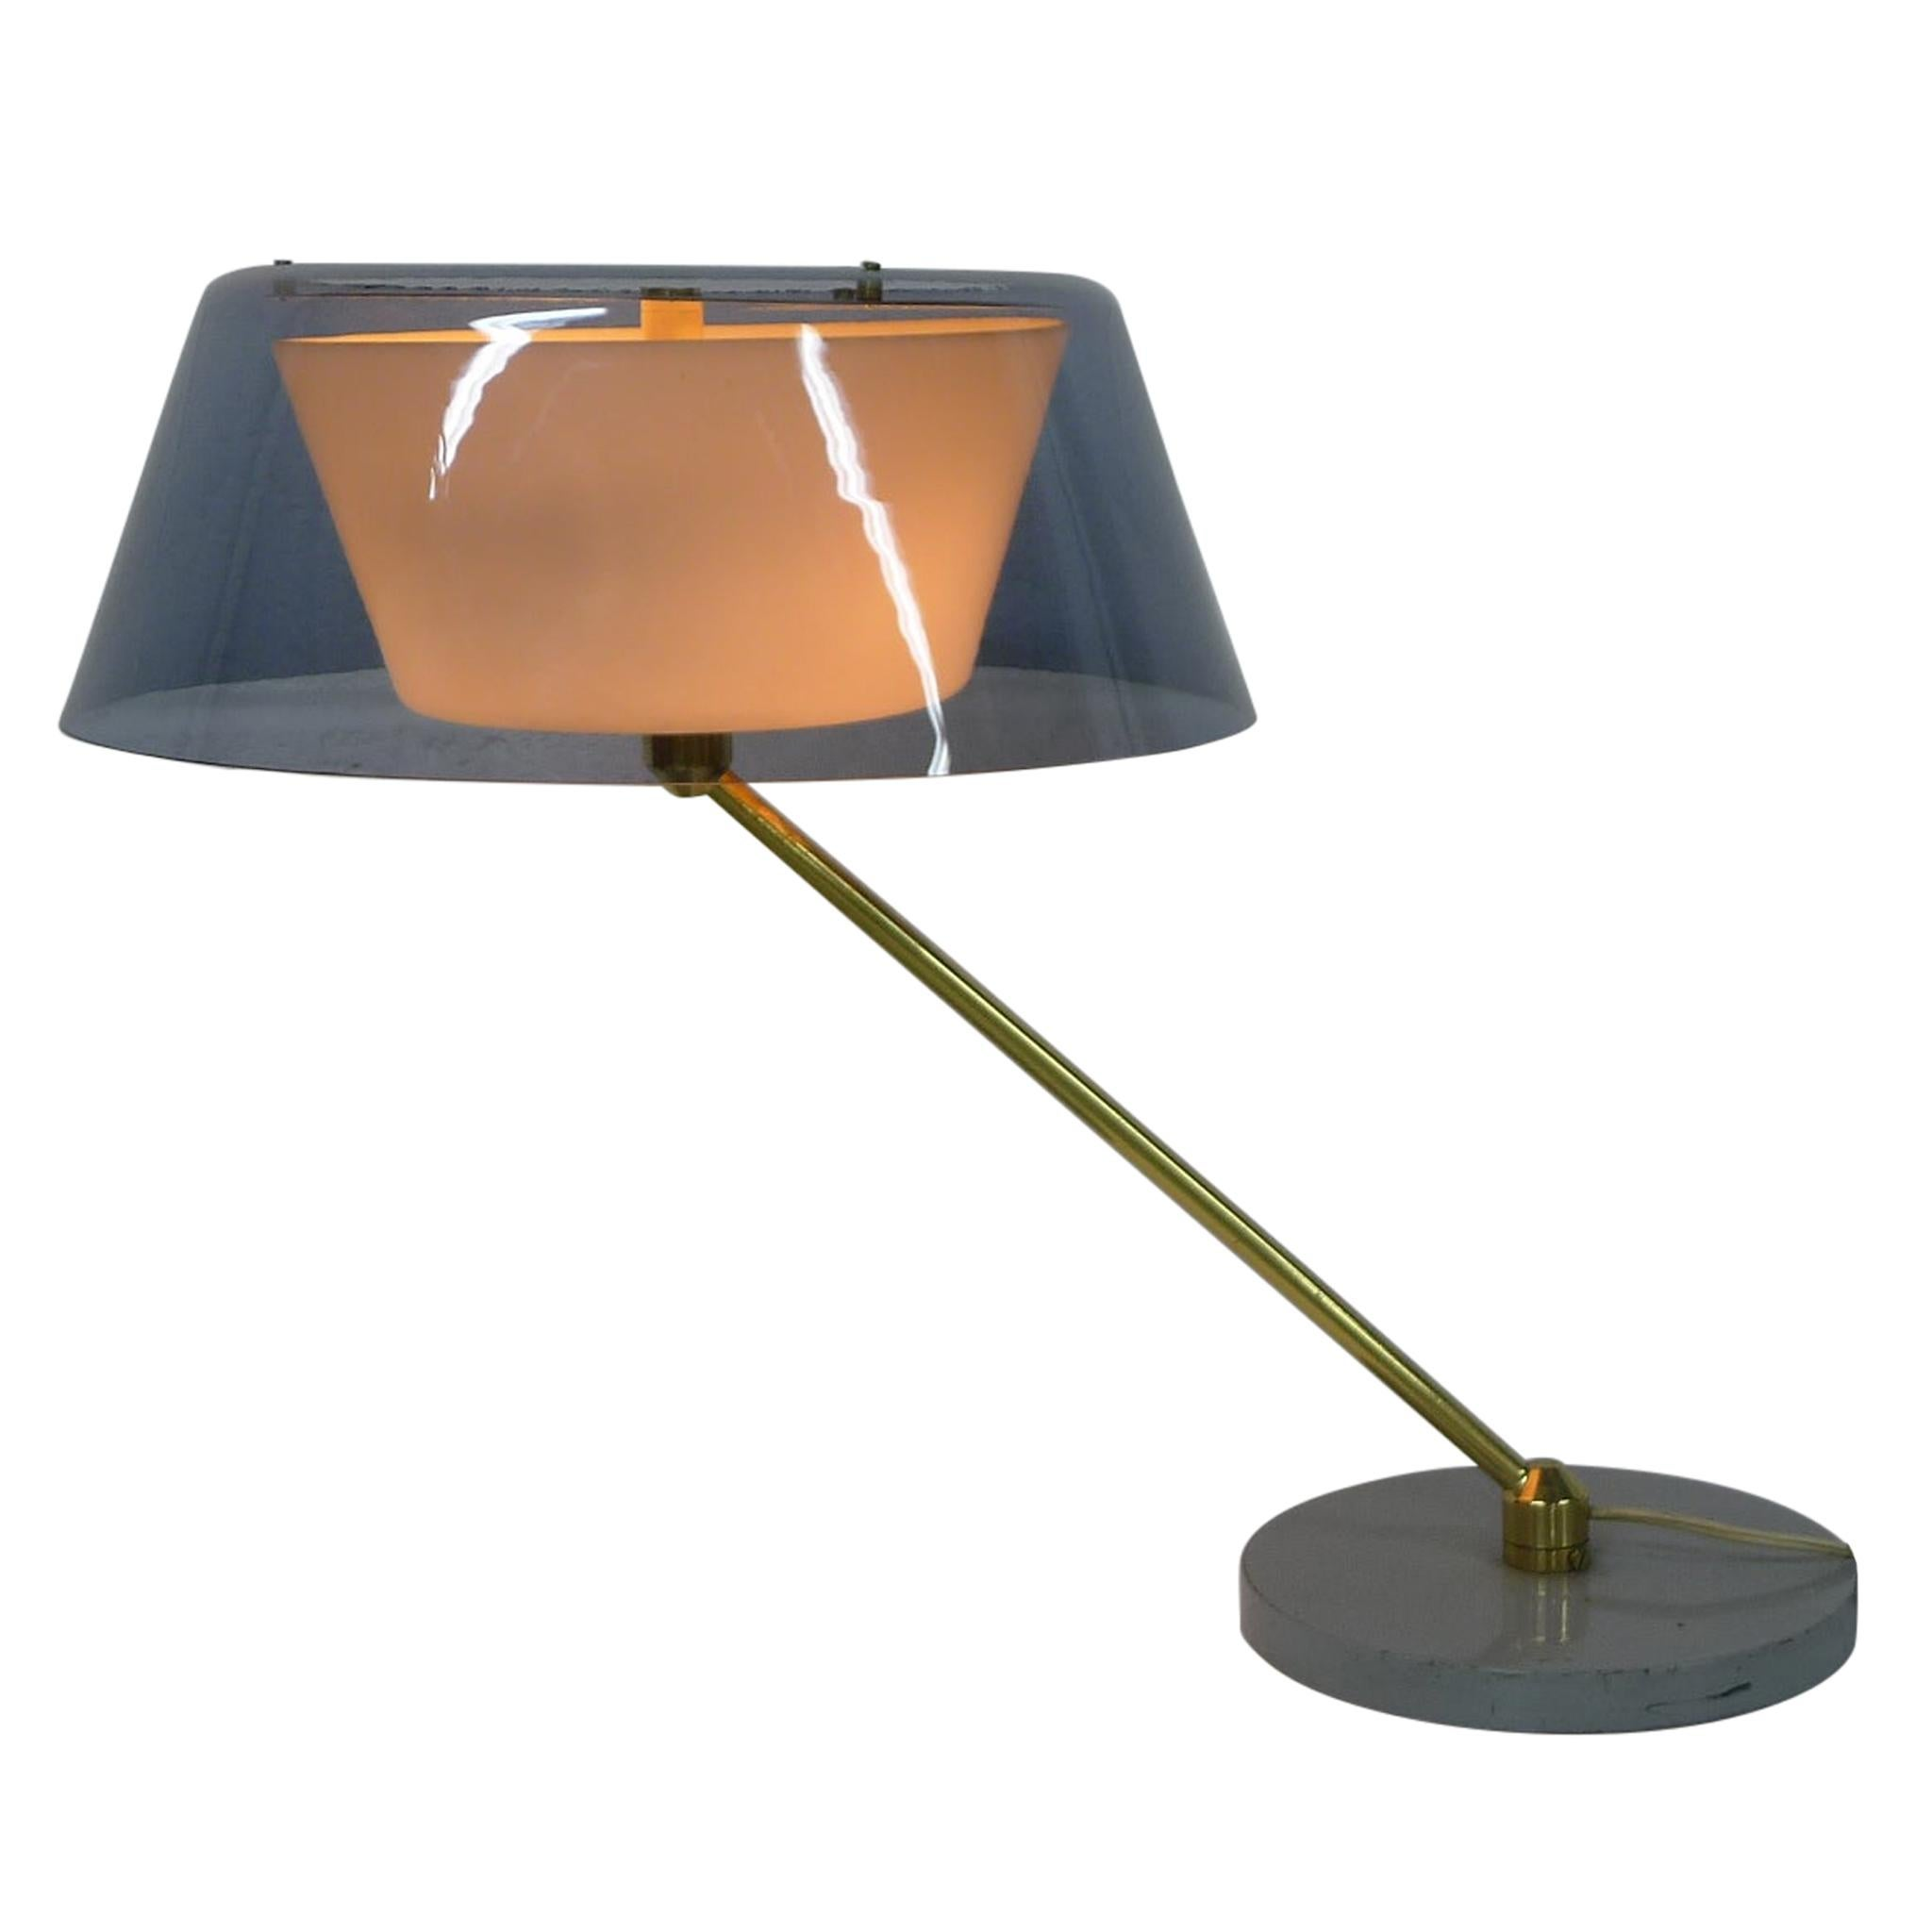 Tito Agnoli, Desk Lamp, Model No. 253 for O'Luce Italy, circa 1960